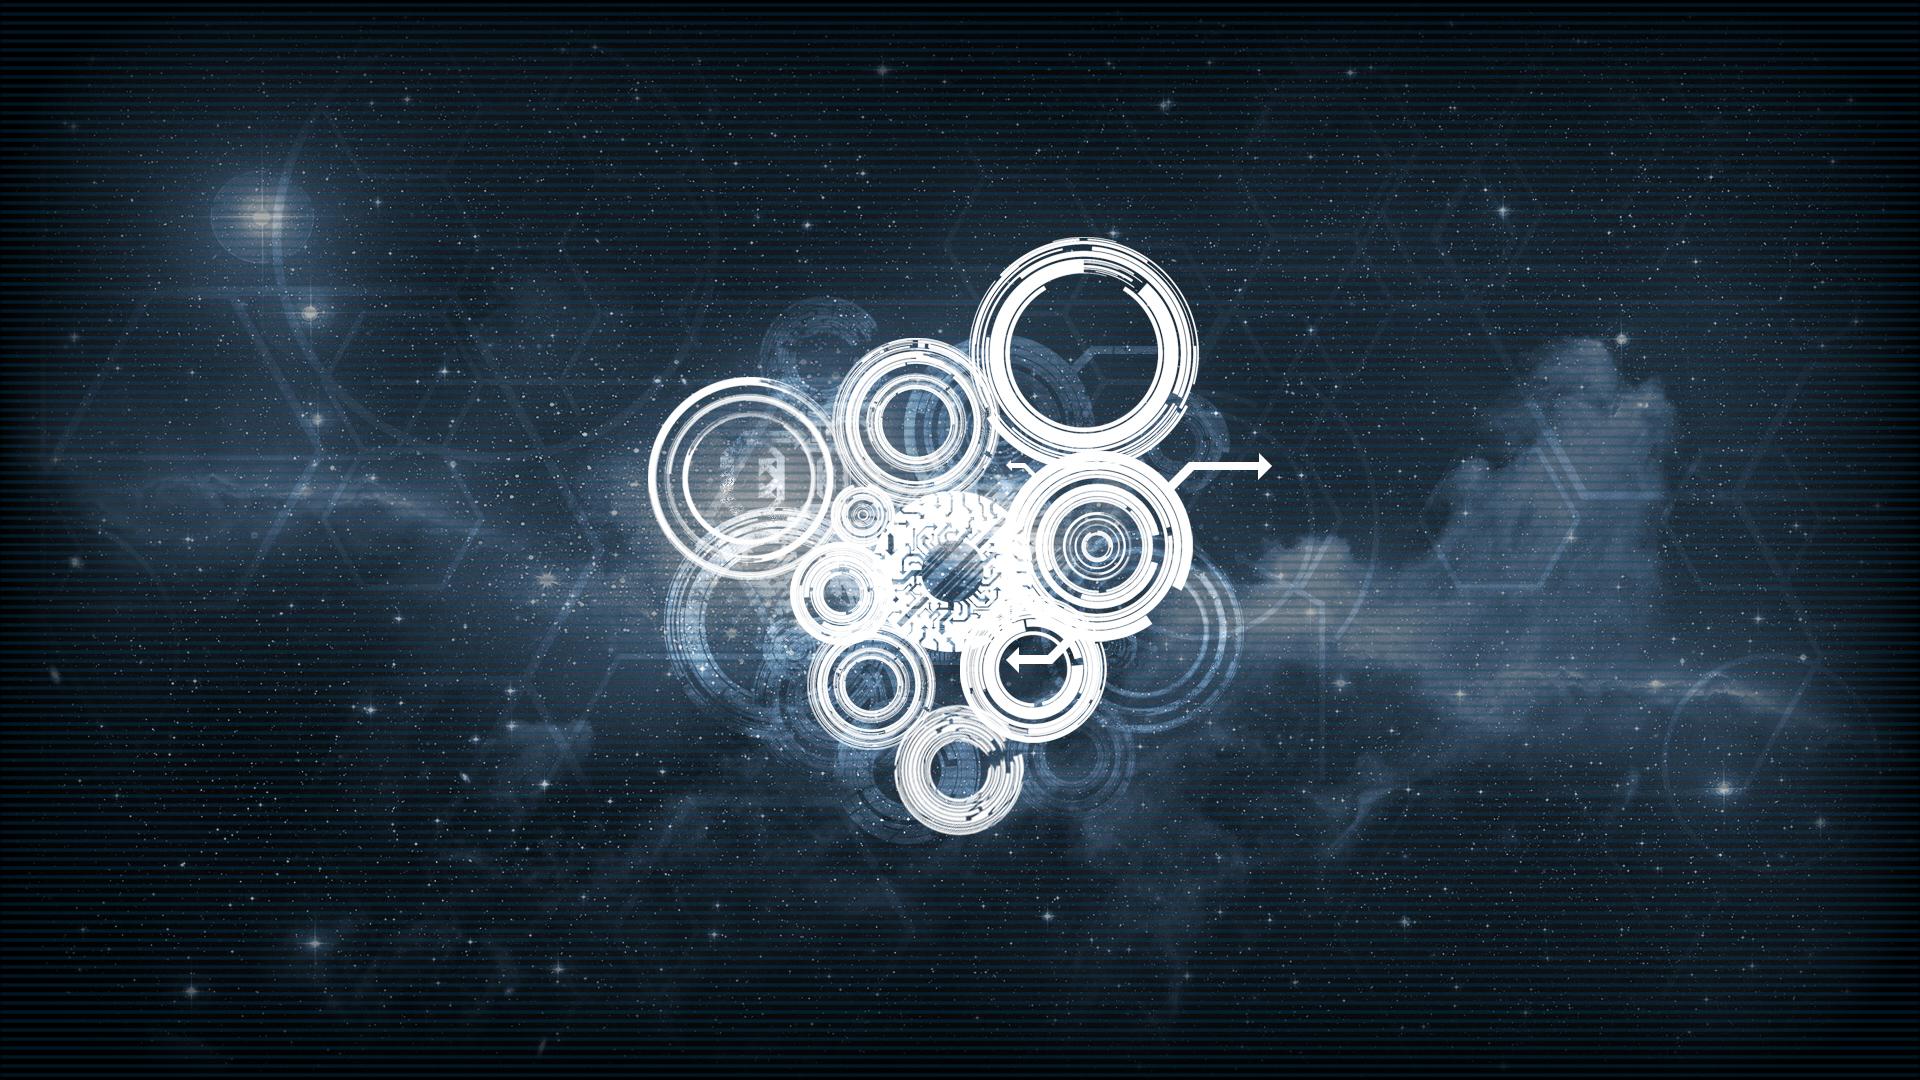 Sci fi Tech Wallpaper by NIHILUSDESIGNS on DeviantArt